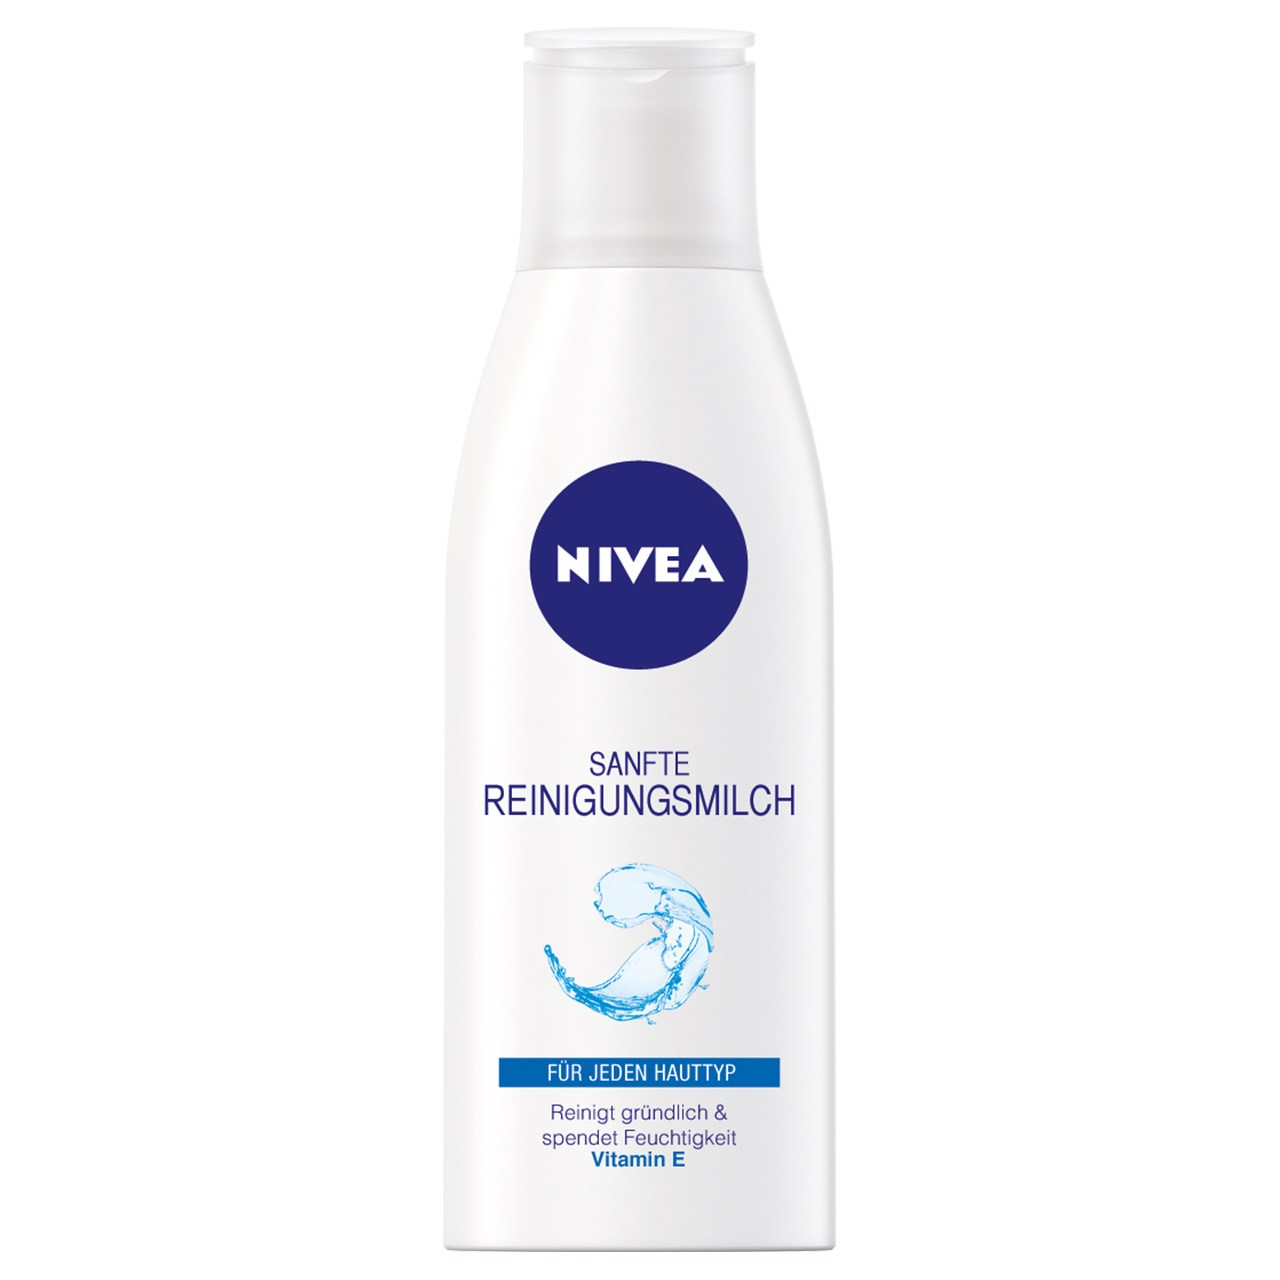 قیمت شیر پاک کن نیوآ مدل Refreshing مناسب پوست نرمال حجم 200 میلی لیتر